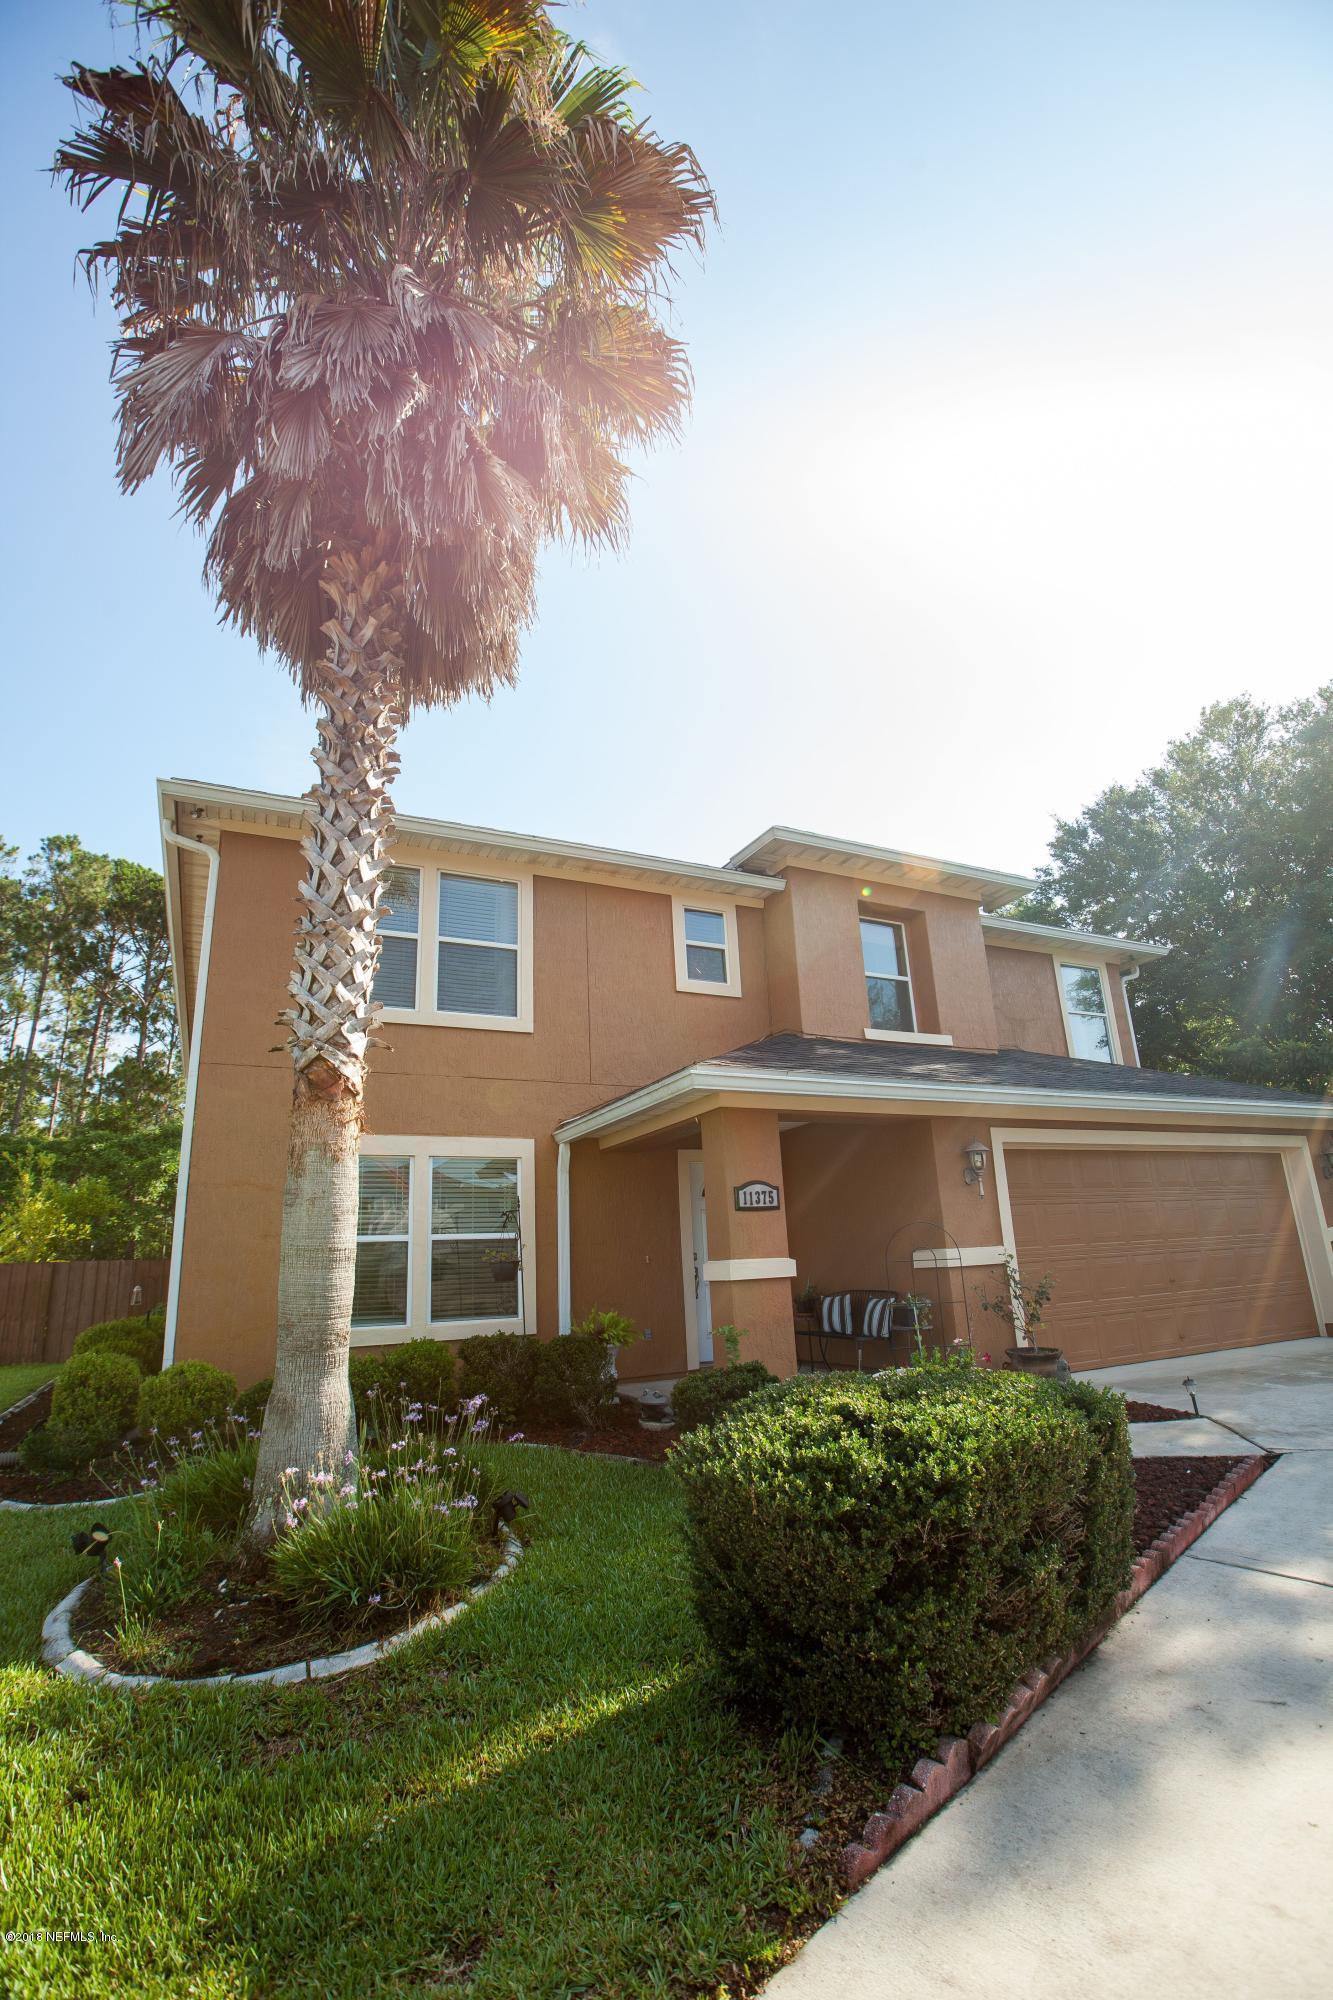 11375 EMMA OAKS, JACKSONVILLE, FLORIDA 32221, 5 Bedrooms Bedrooms, ,2 BathroomsBathrooms,Residential - single family,For sale,EMMA OAKS,964931